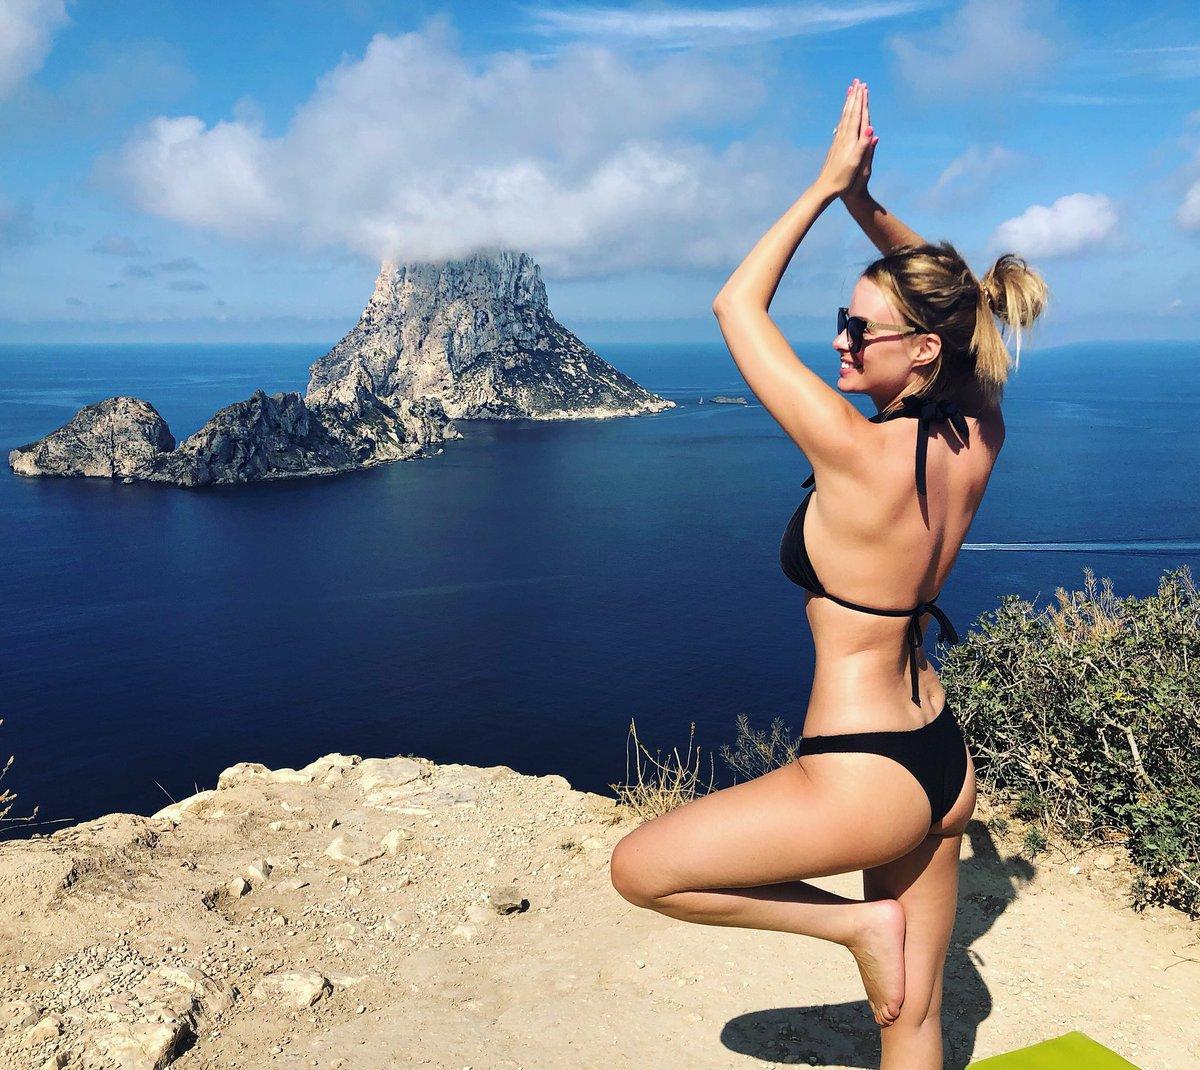 Bit of yoga up at #EsVedra #Ibiza today!  ????????♀️????????♀️ https://t.co/K3KXAzCyFS